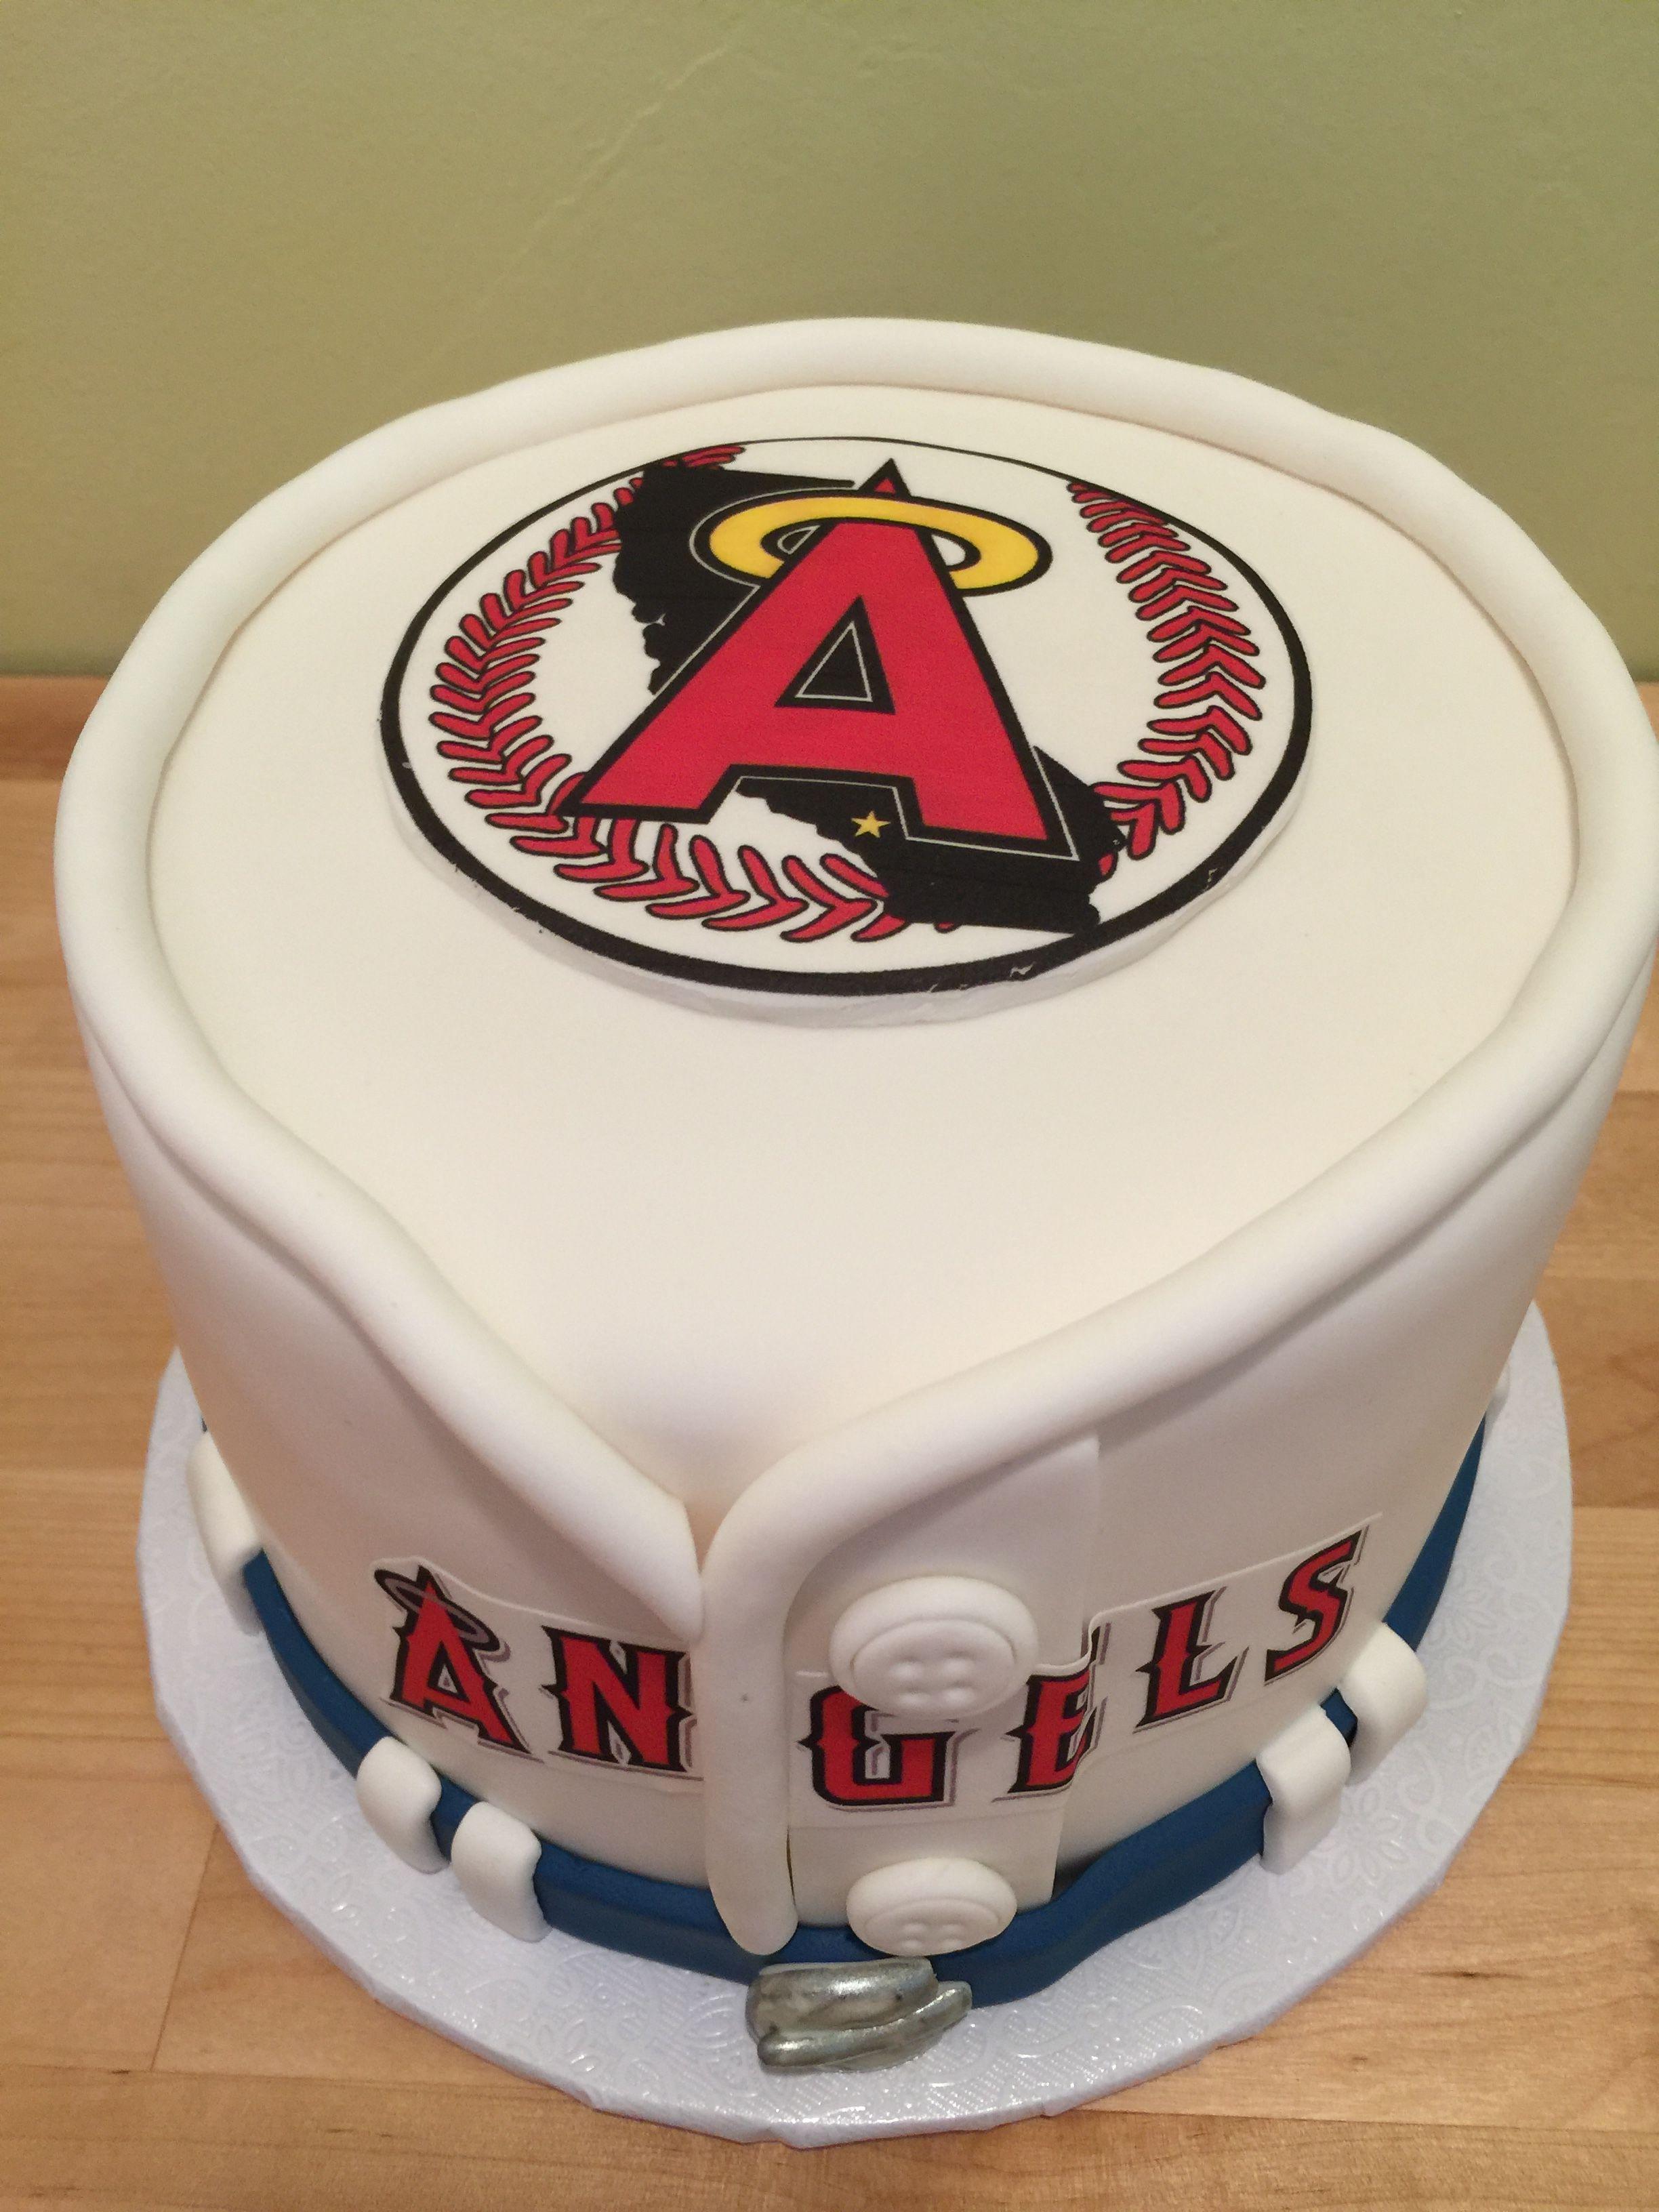 Angels Baseball Cake With Images Baseball Cake Sports Themed